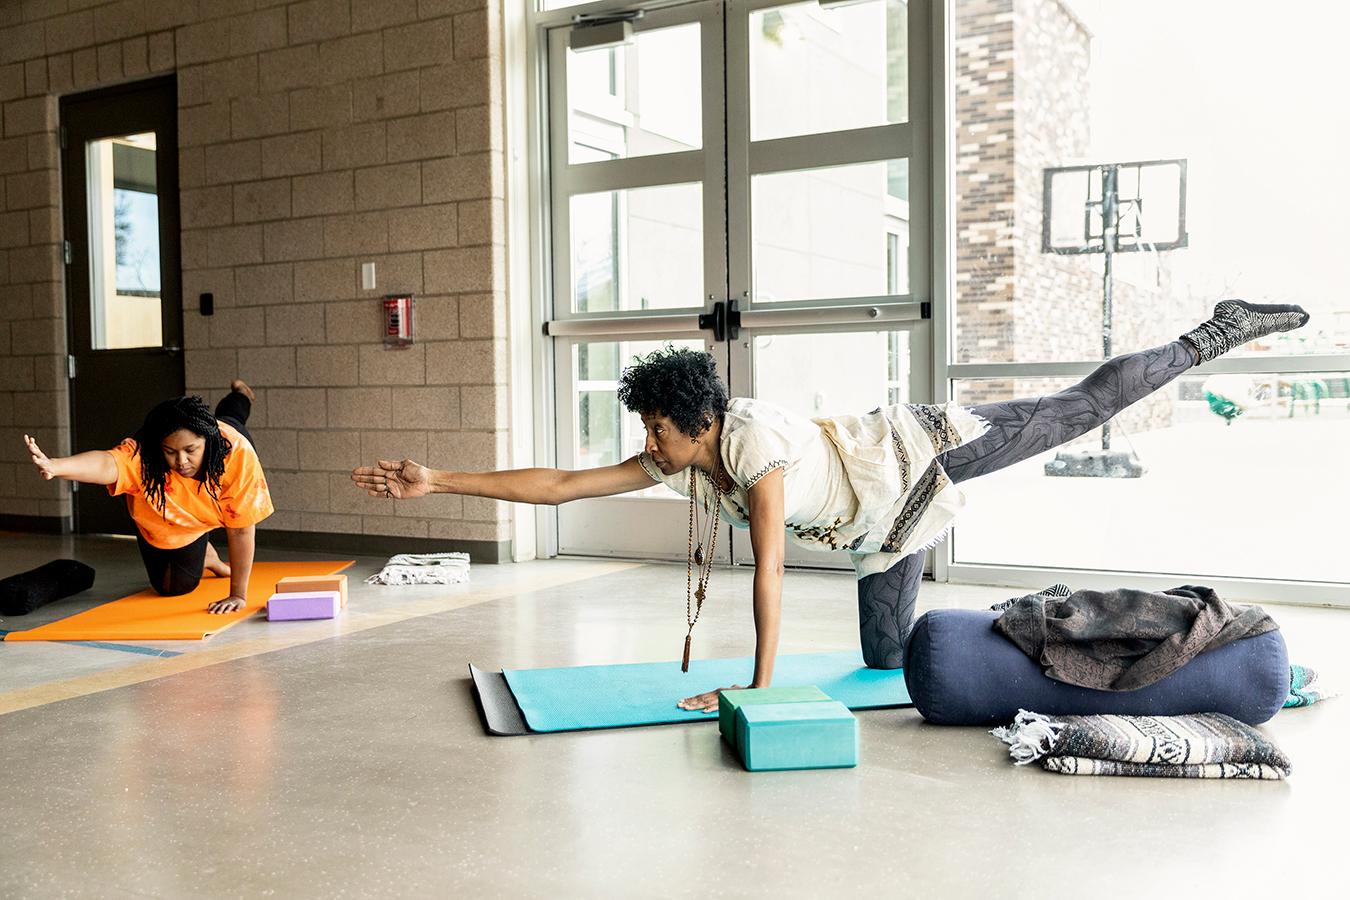 Namaste Noir Yoga Co Op Seeks To Diversify Yoga To Heal Racialized Trauma Kaiser Health News